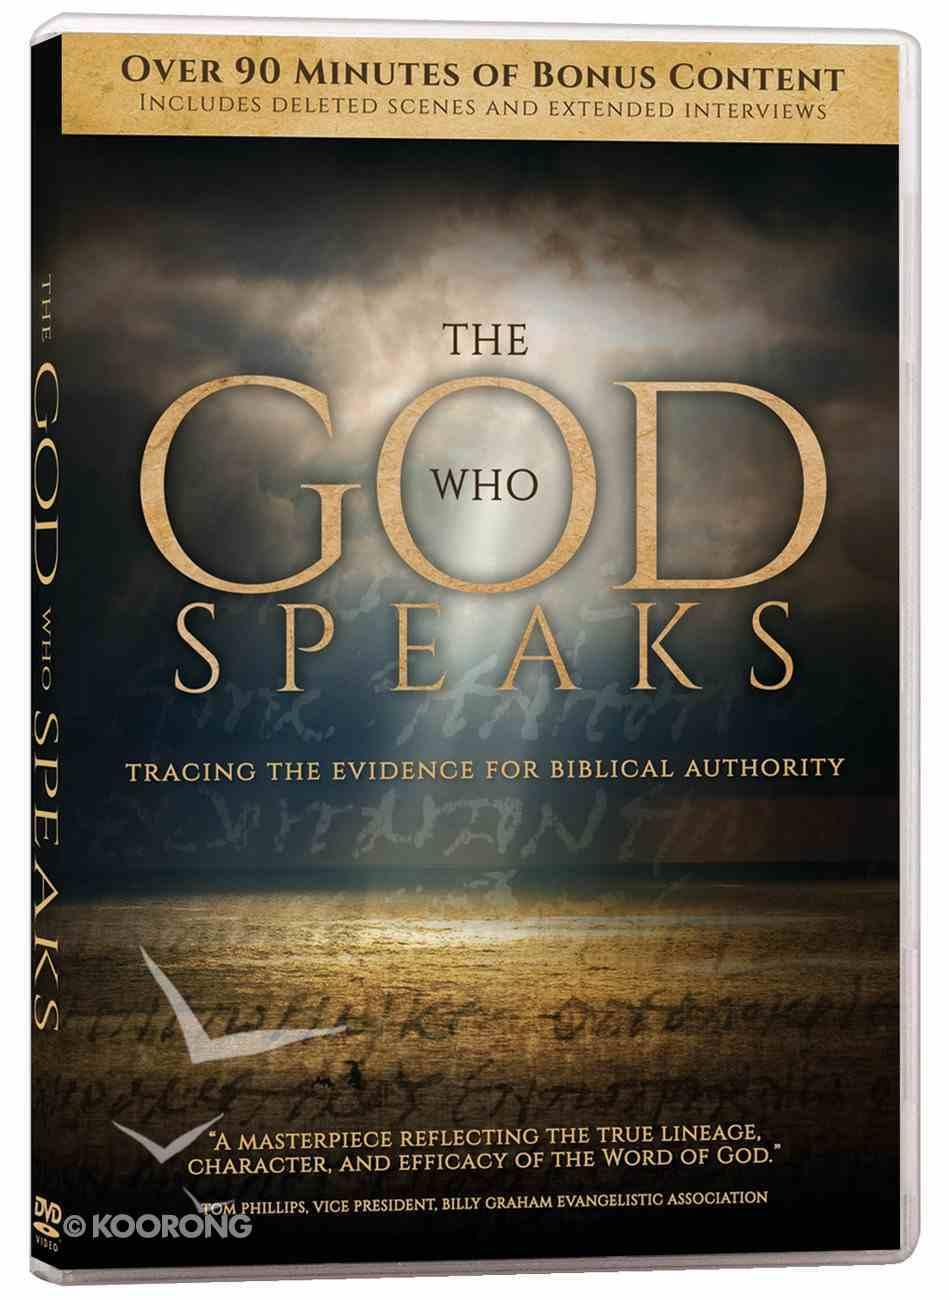 The God Who Speaks (2 Dvds) DVD